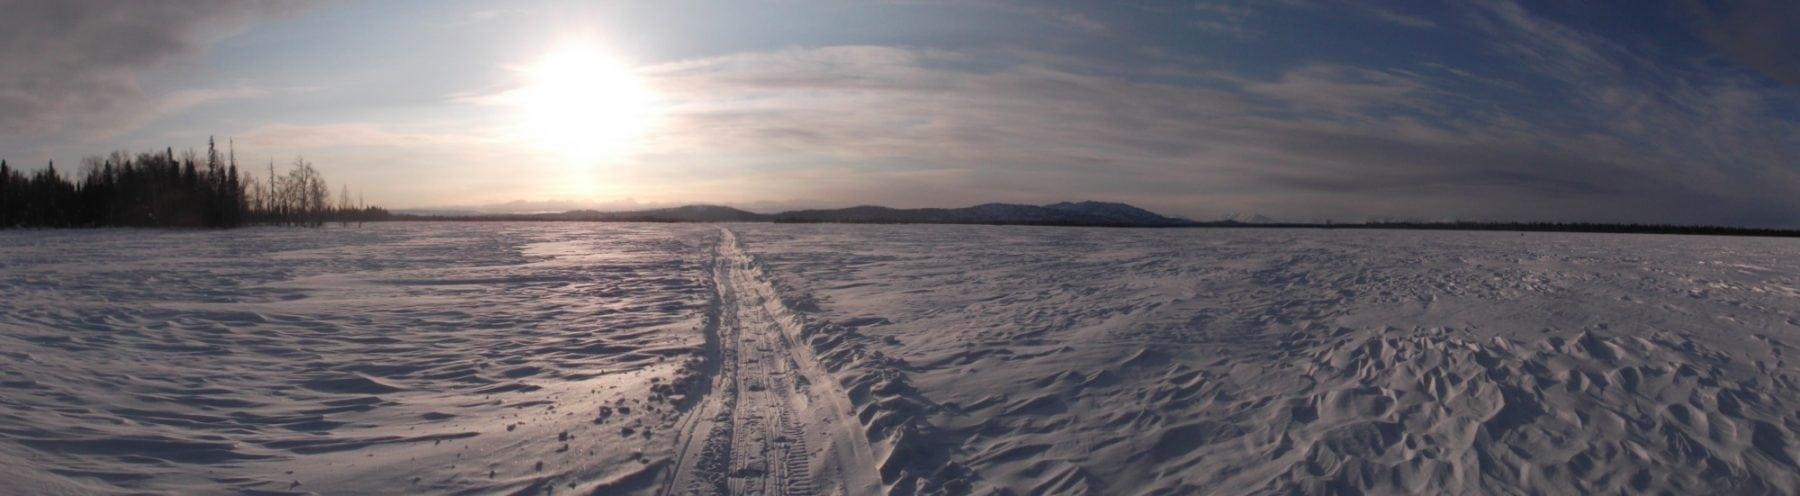 Iditarod Trail Invitational 2012 - Skwentna